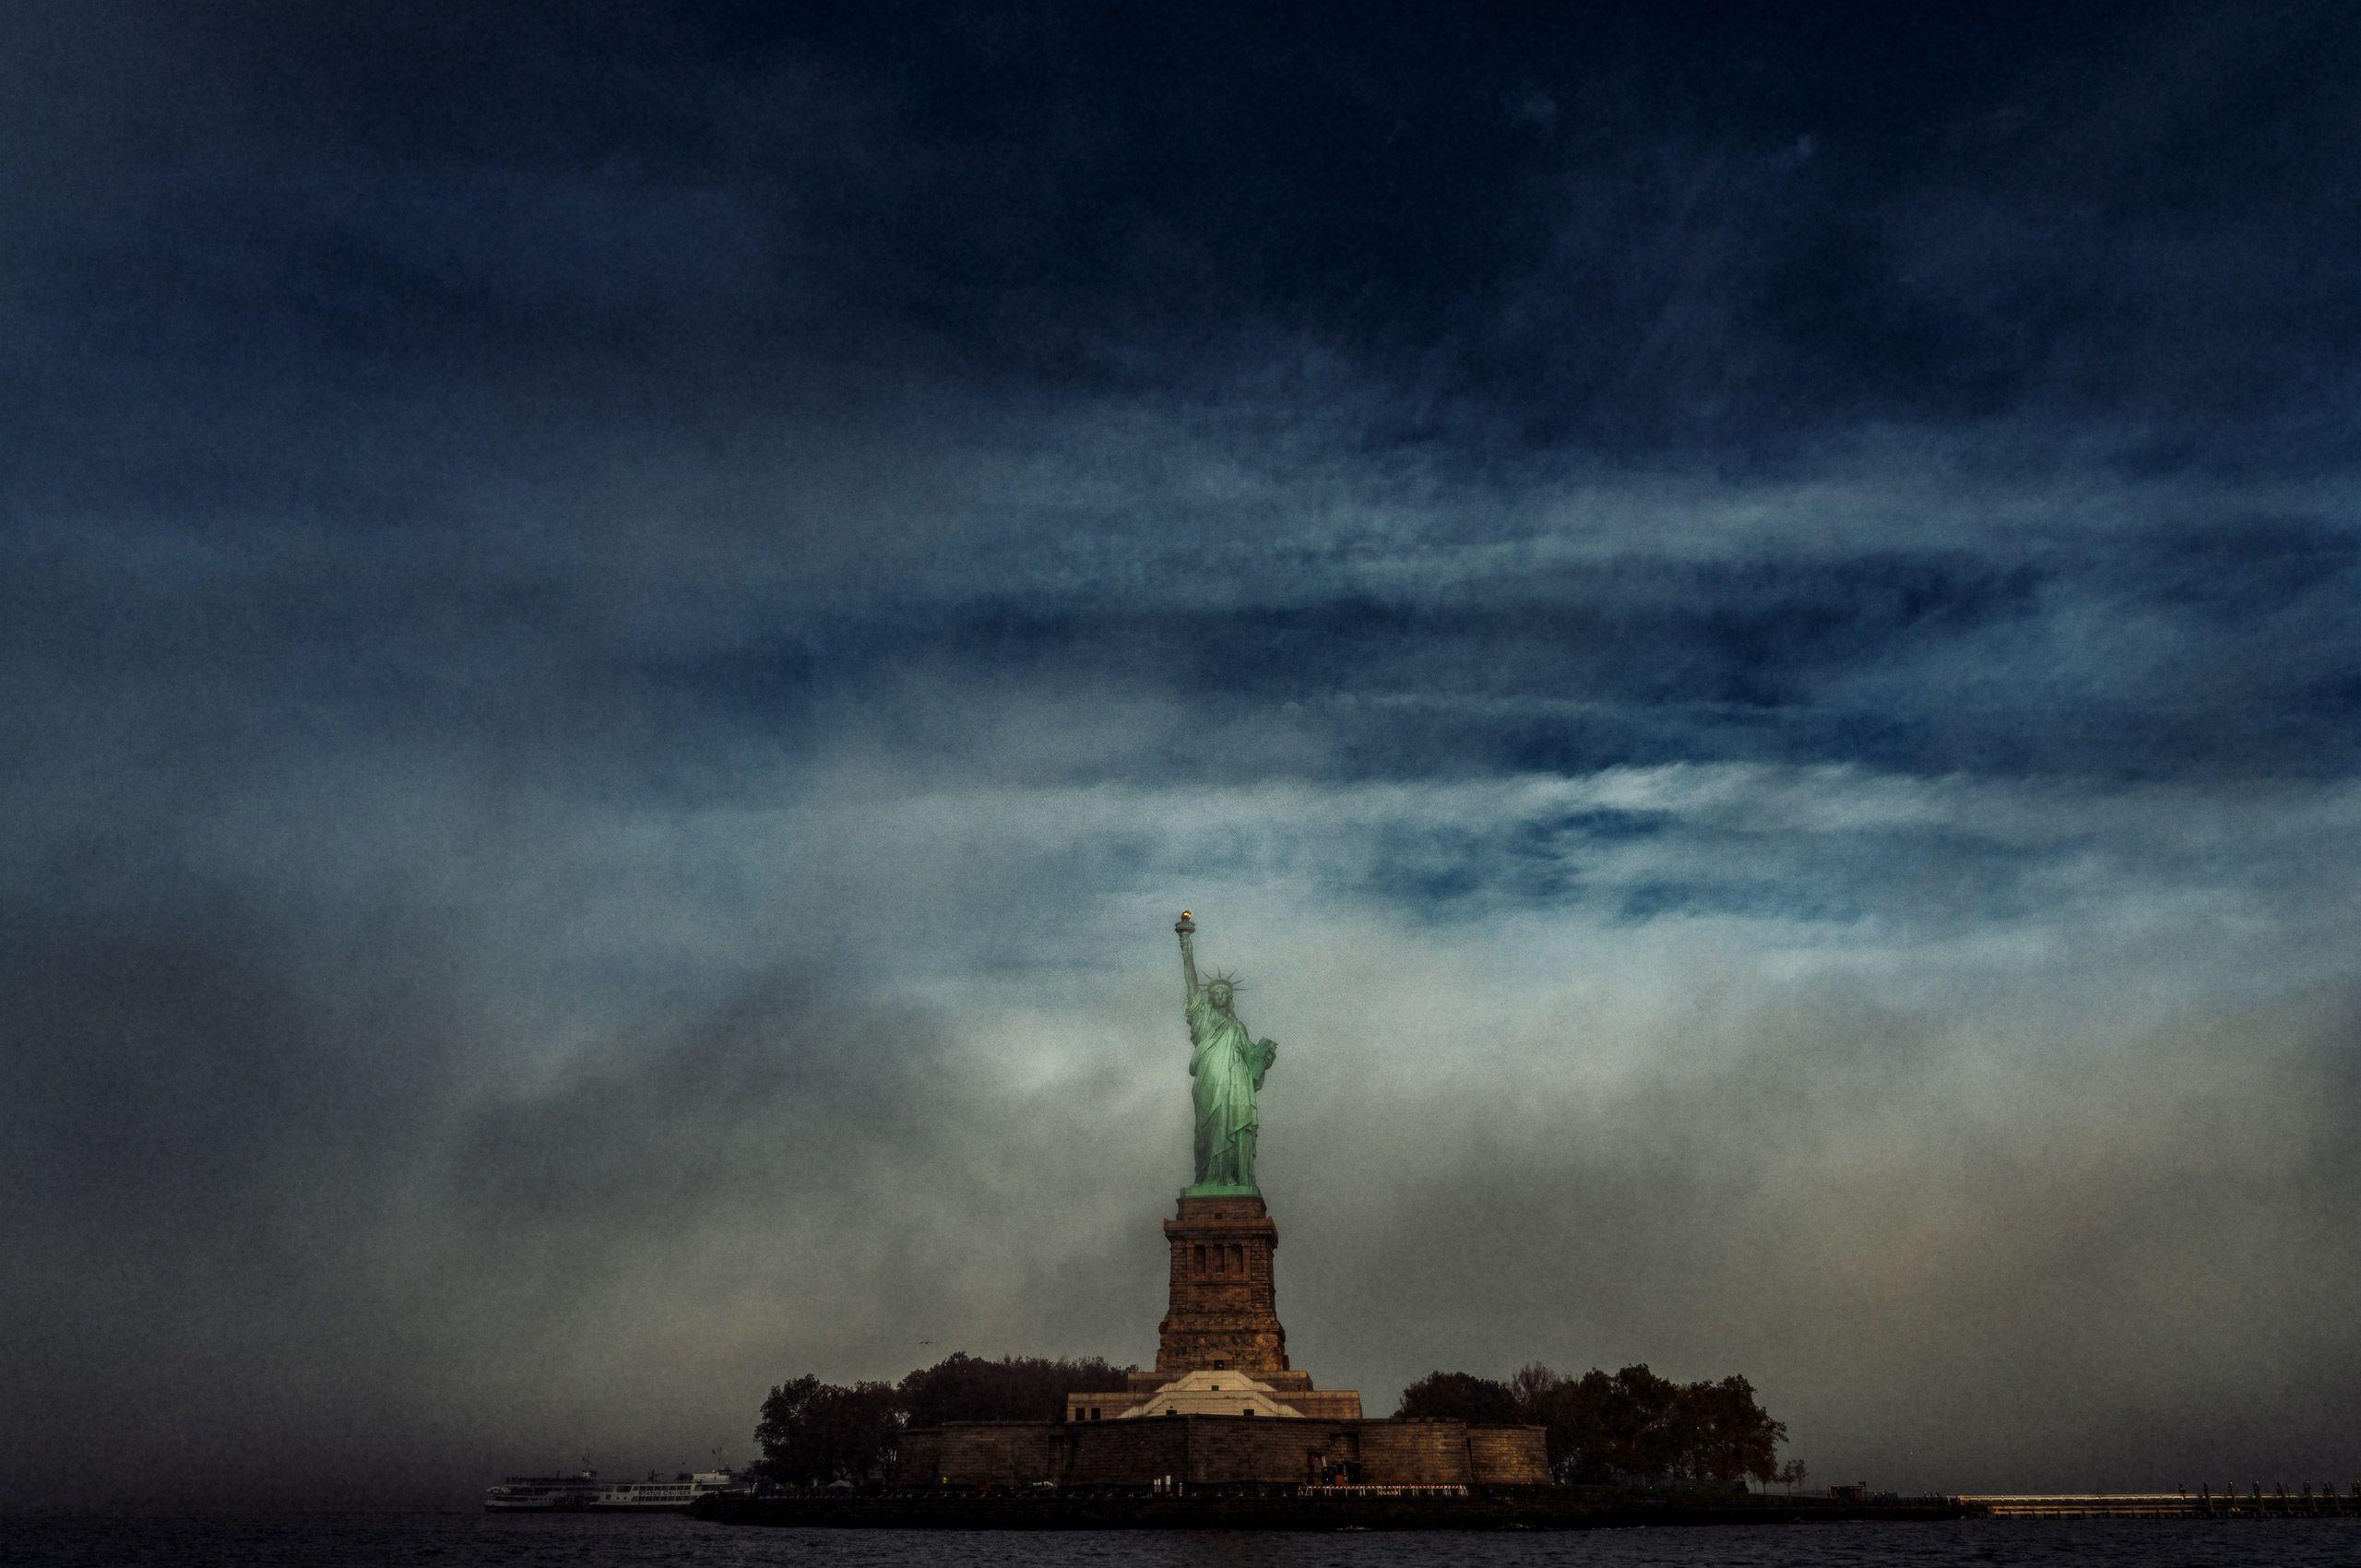 StatueOfLiberty-Foggy-NewYork-HenrikOlundPhotography.jpg